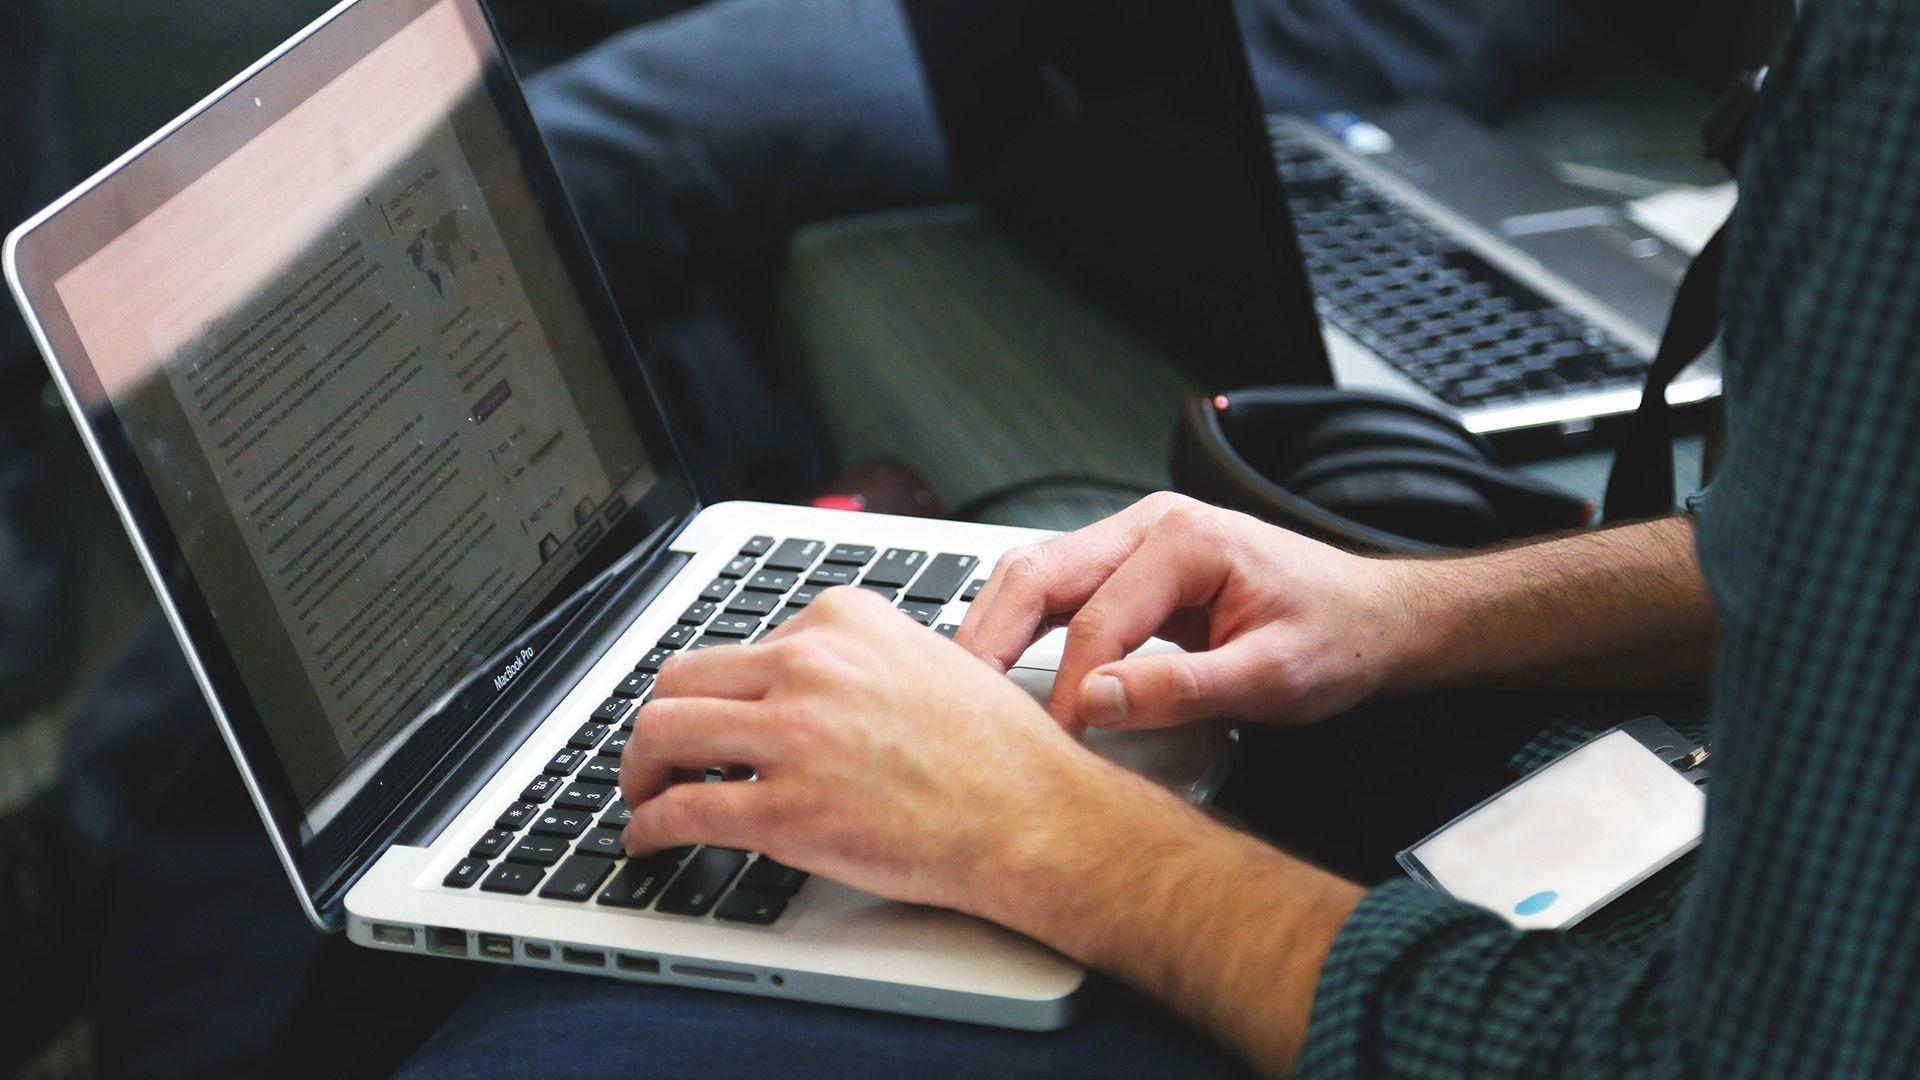 Creating an Internet for everyone everywhere